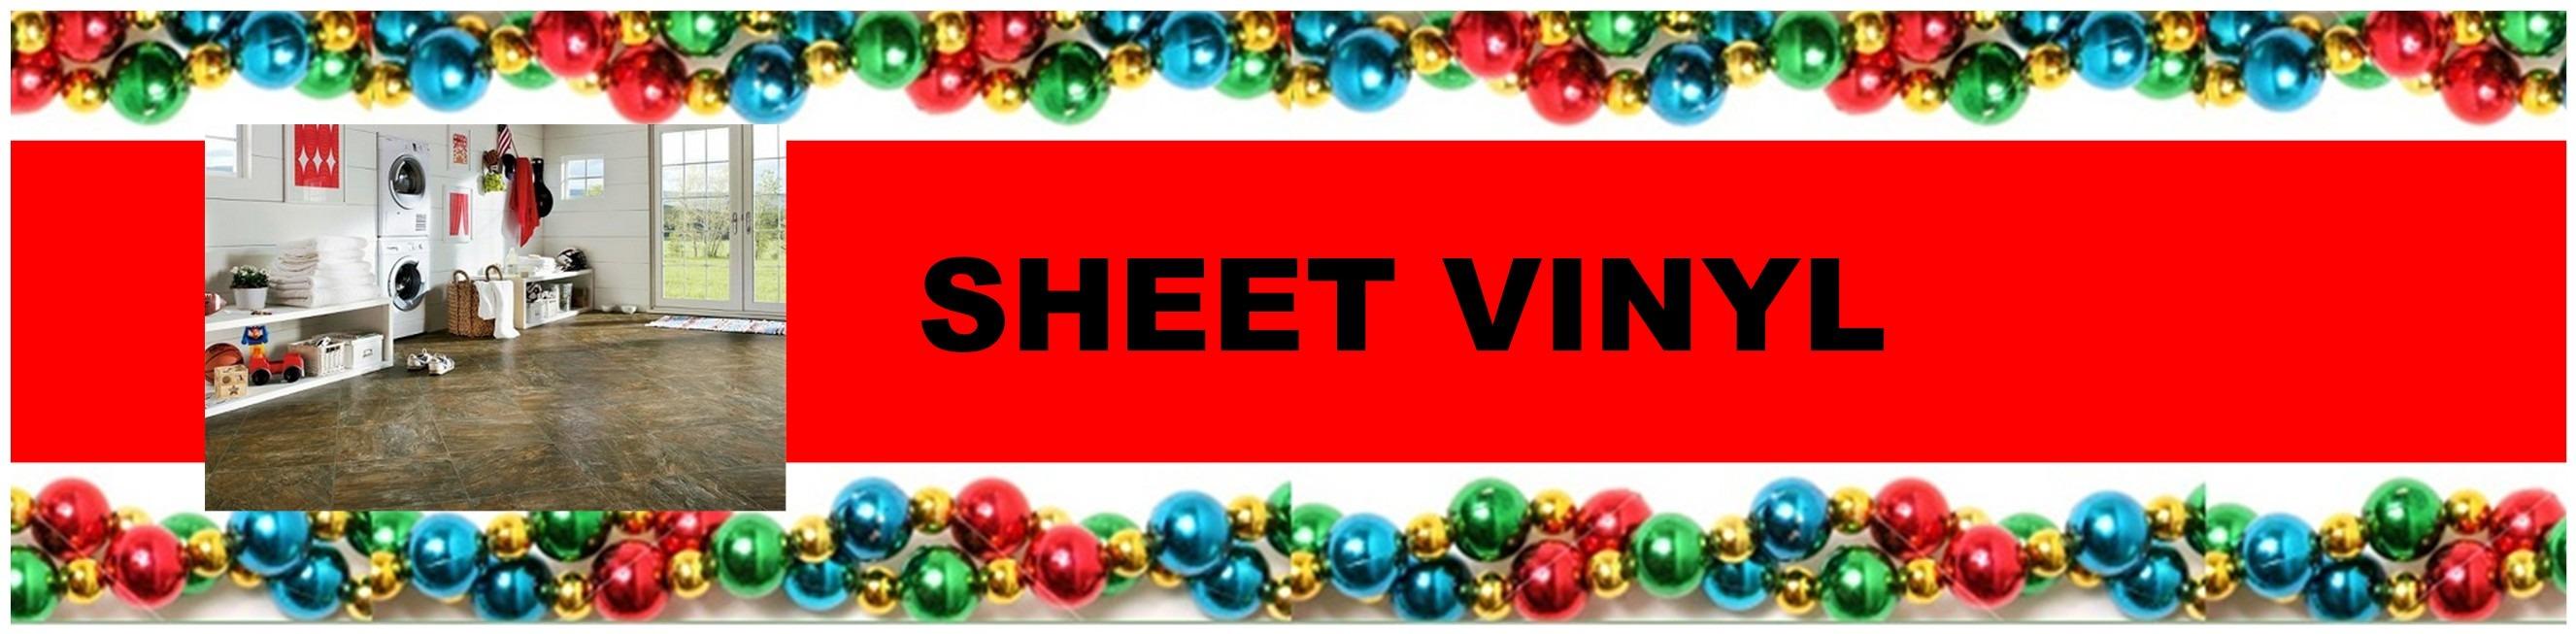 CHRISTMAS SHEET VINYL HEADER